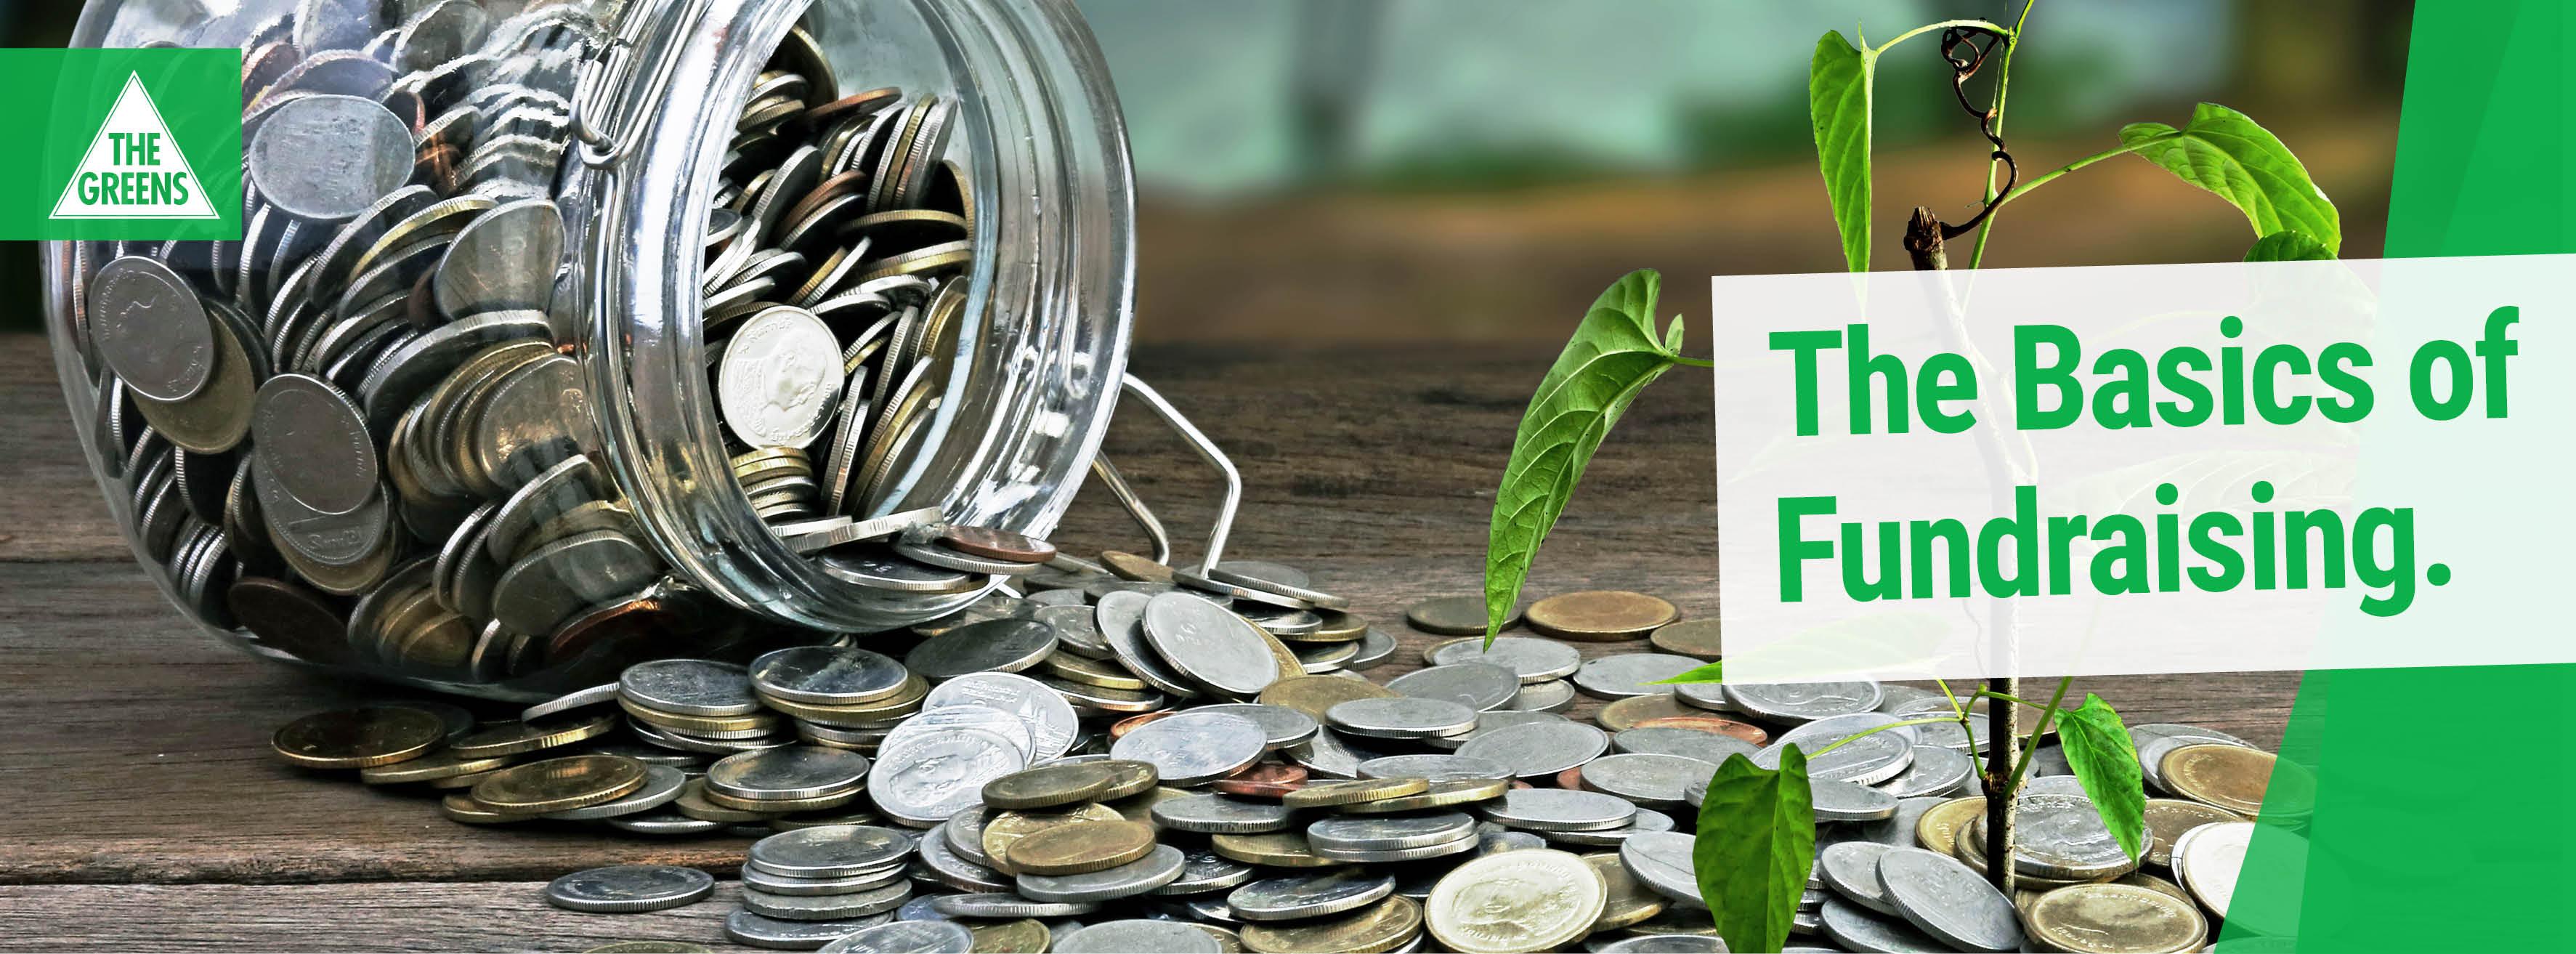 Fundraising_Basics_NB2.jpg